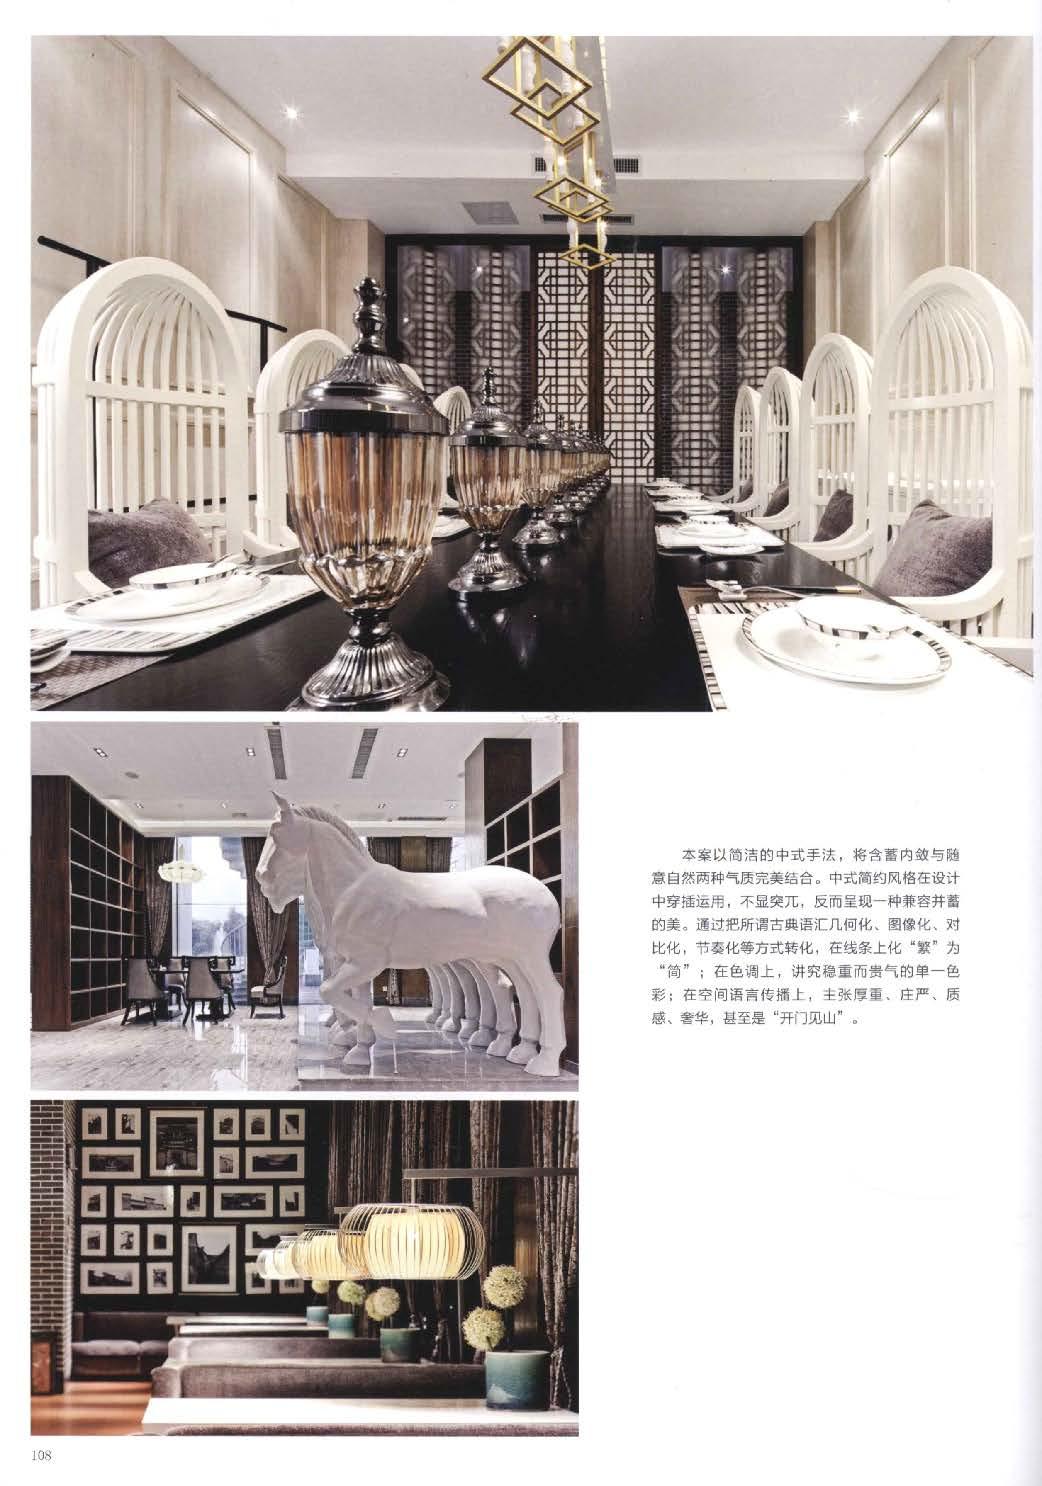 H073 东方风情 会所、餐饮细部解析_Page_106.jpg